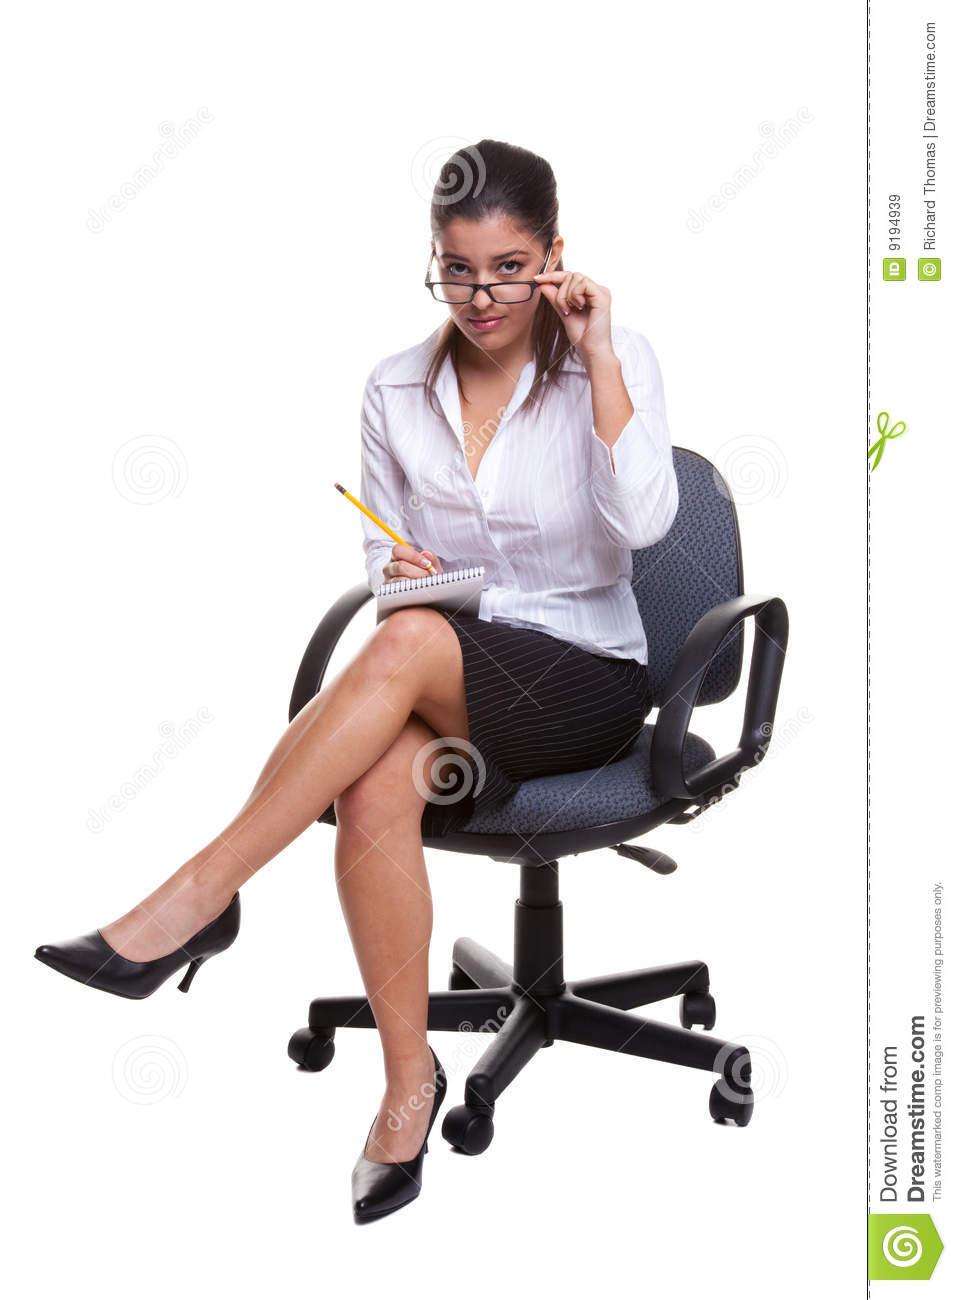 cartoon office shirt photo - 1